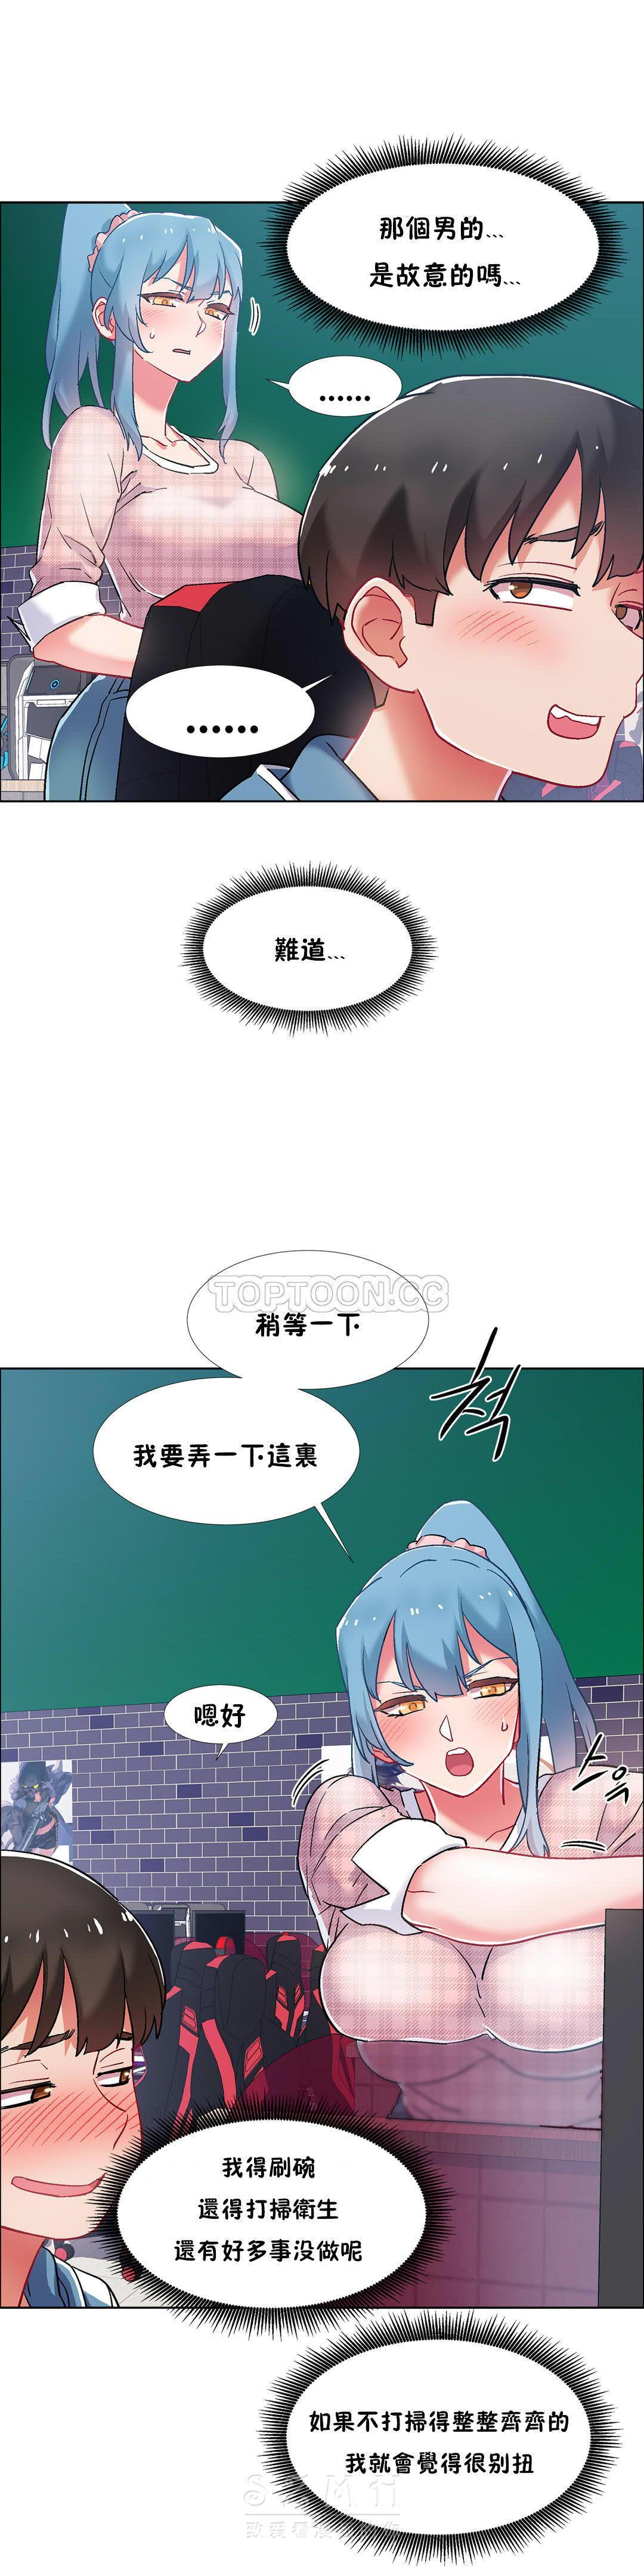 [Studio Wannabe] Rental Girls | 出租女郎 Ch. 33-58 [Chinese]  第二季 完结 59